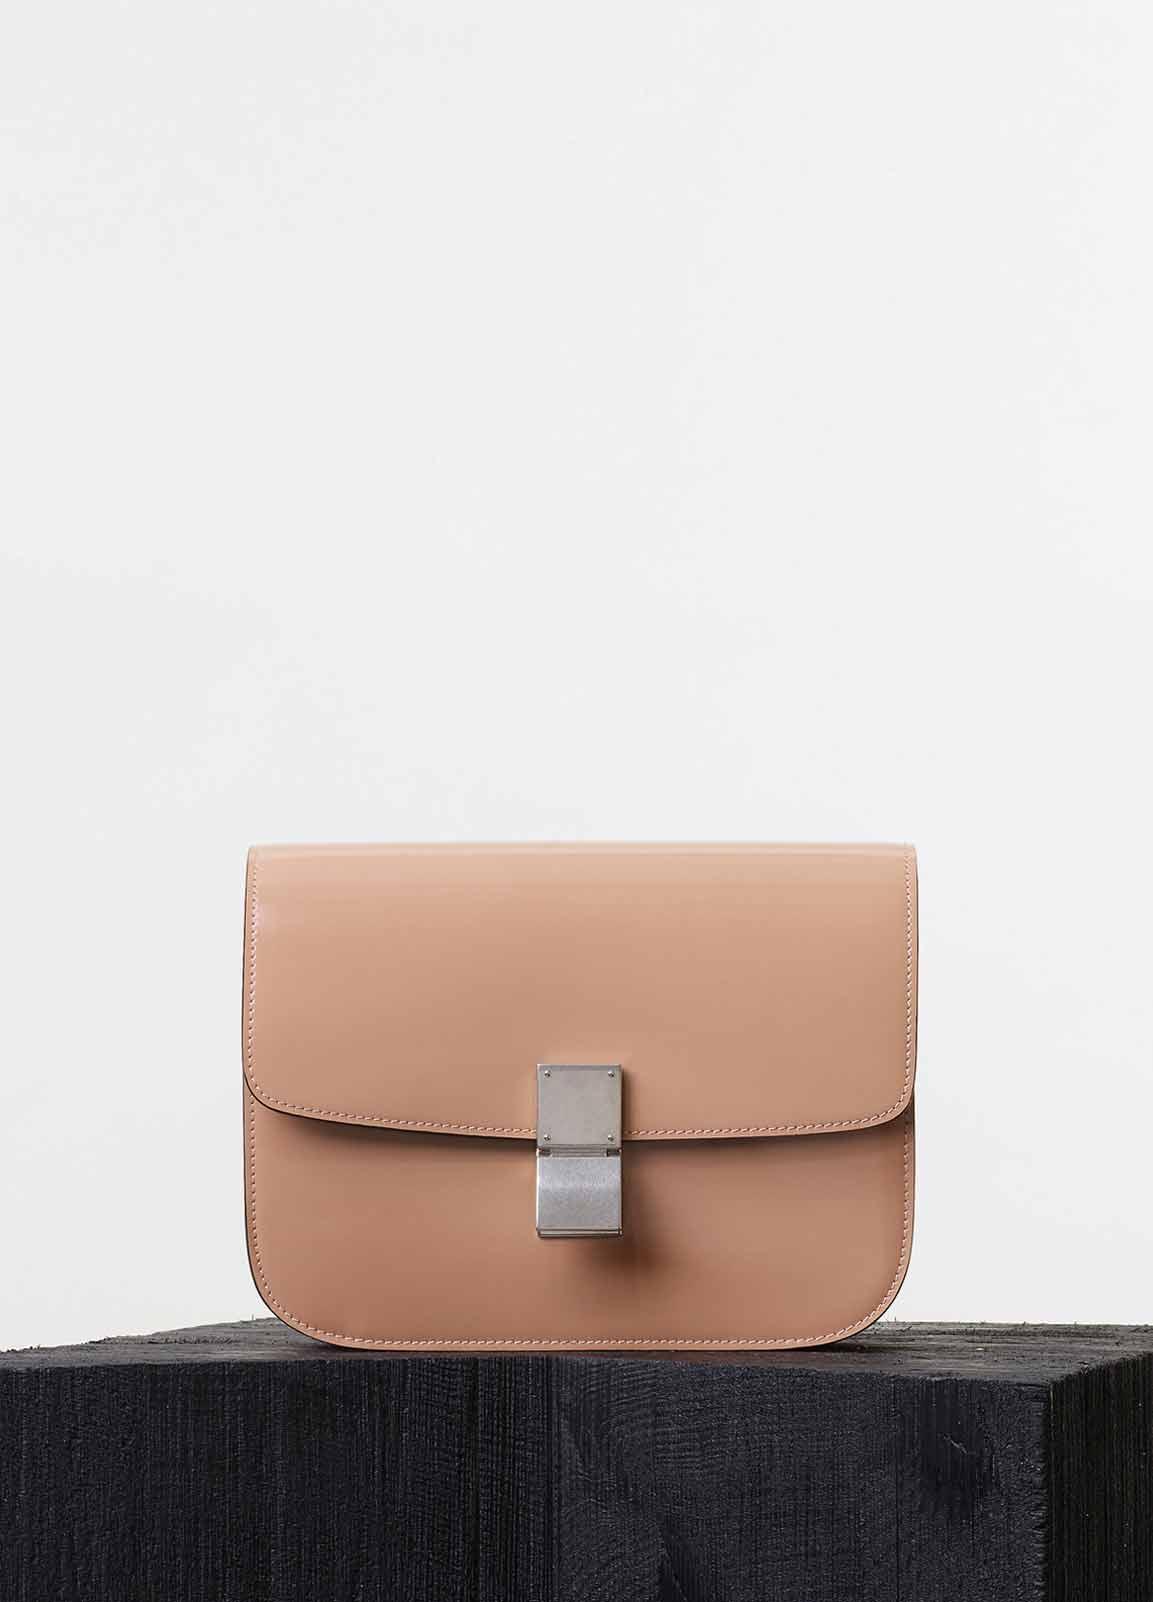 Celine Nude Spazzolato Calfskin Classic Box Medium Bag 953c6a3f6cb7c